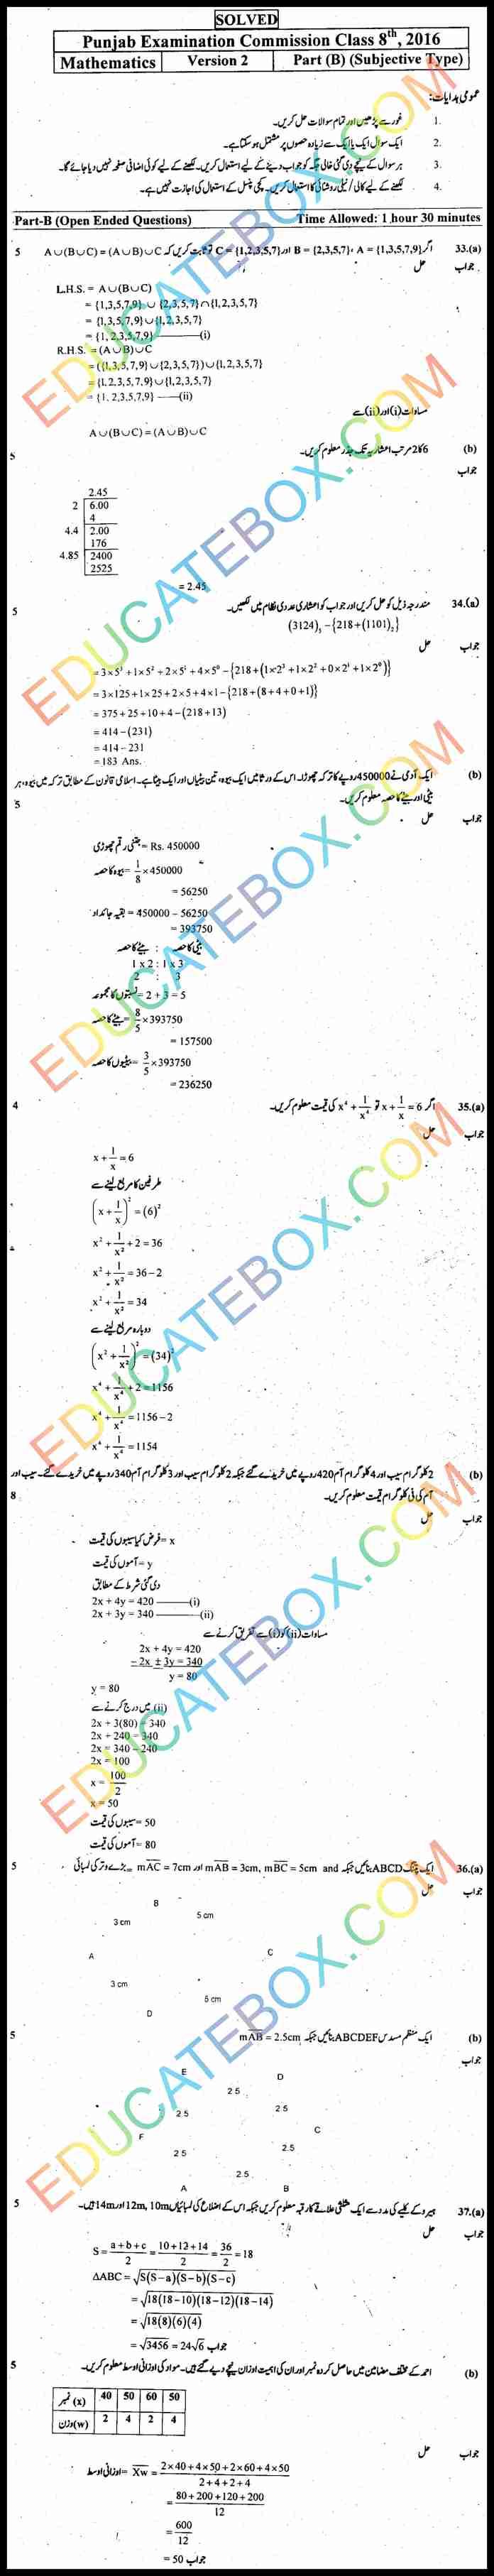 Past Paper 8th Class Maths 2016 Solved Paper Punjab Board (PEC) Subjective Type Urdu Medium Version 2 اپ ٹو ڈیٹ پیپر ہشتم کلاس ریاضی حل شدہ پیپر پنجاب بورڈ سبجیکٹیو ٹائپ اردو میڈیم ورژن 2